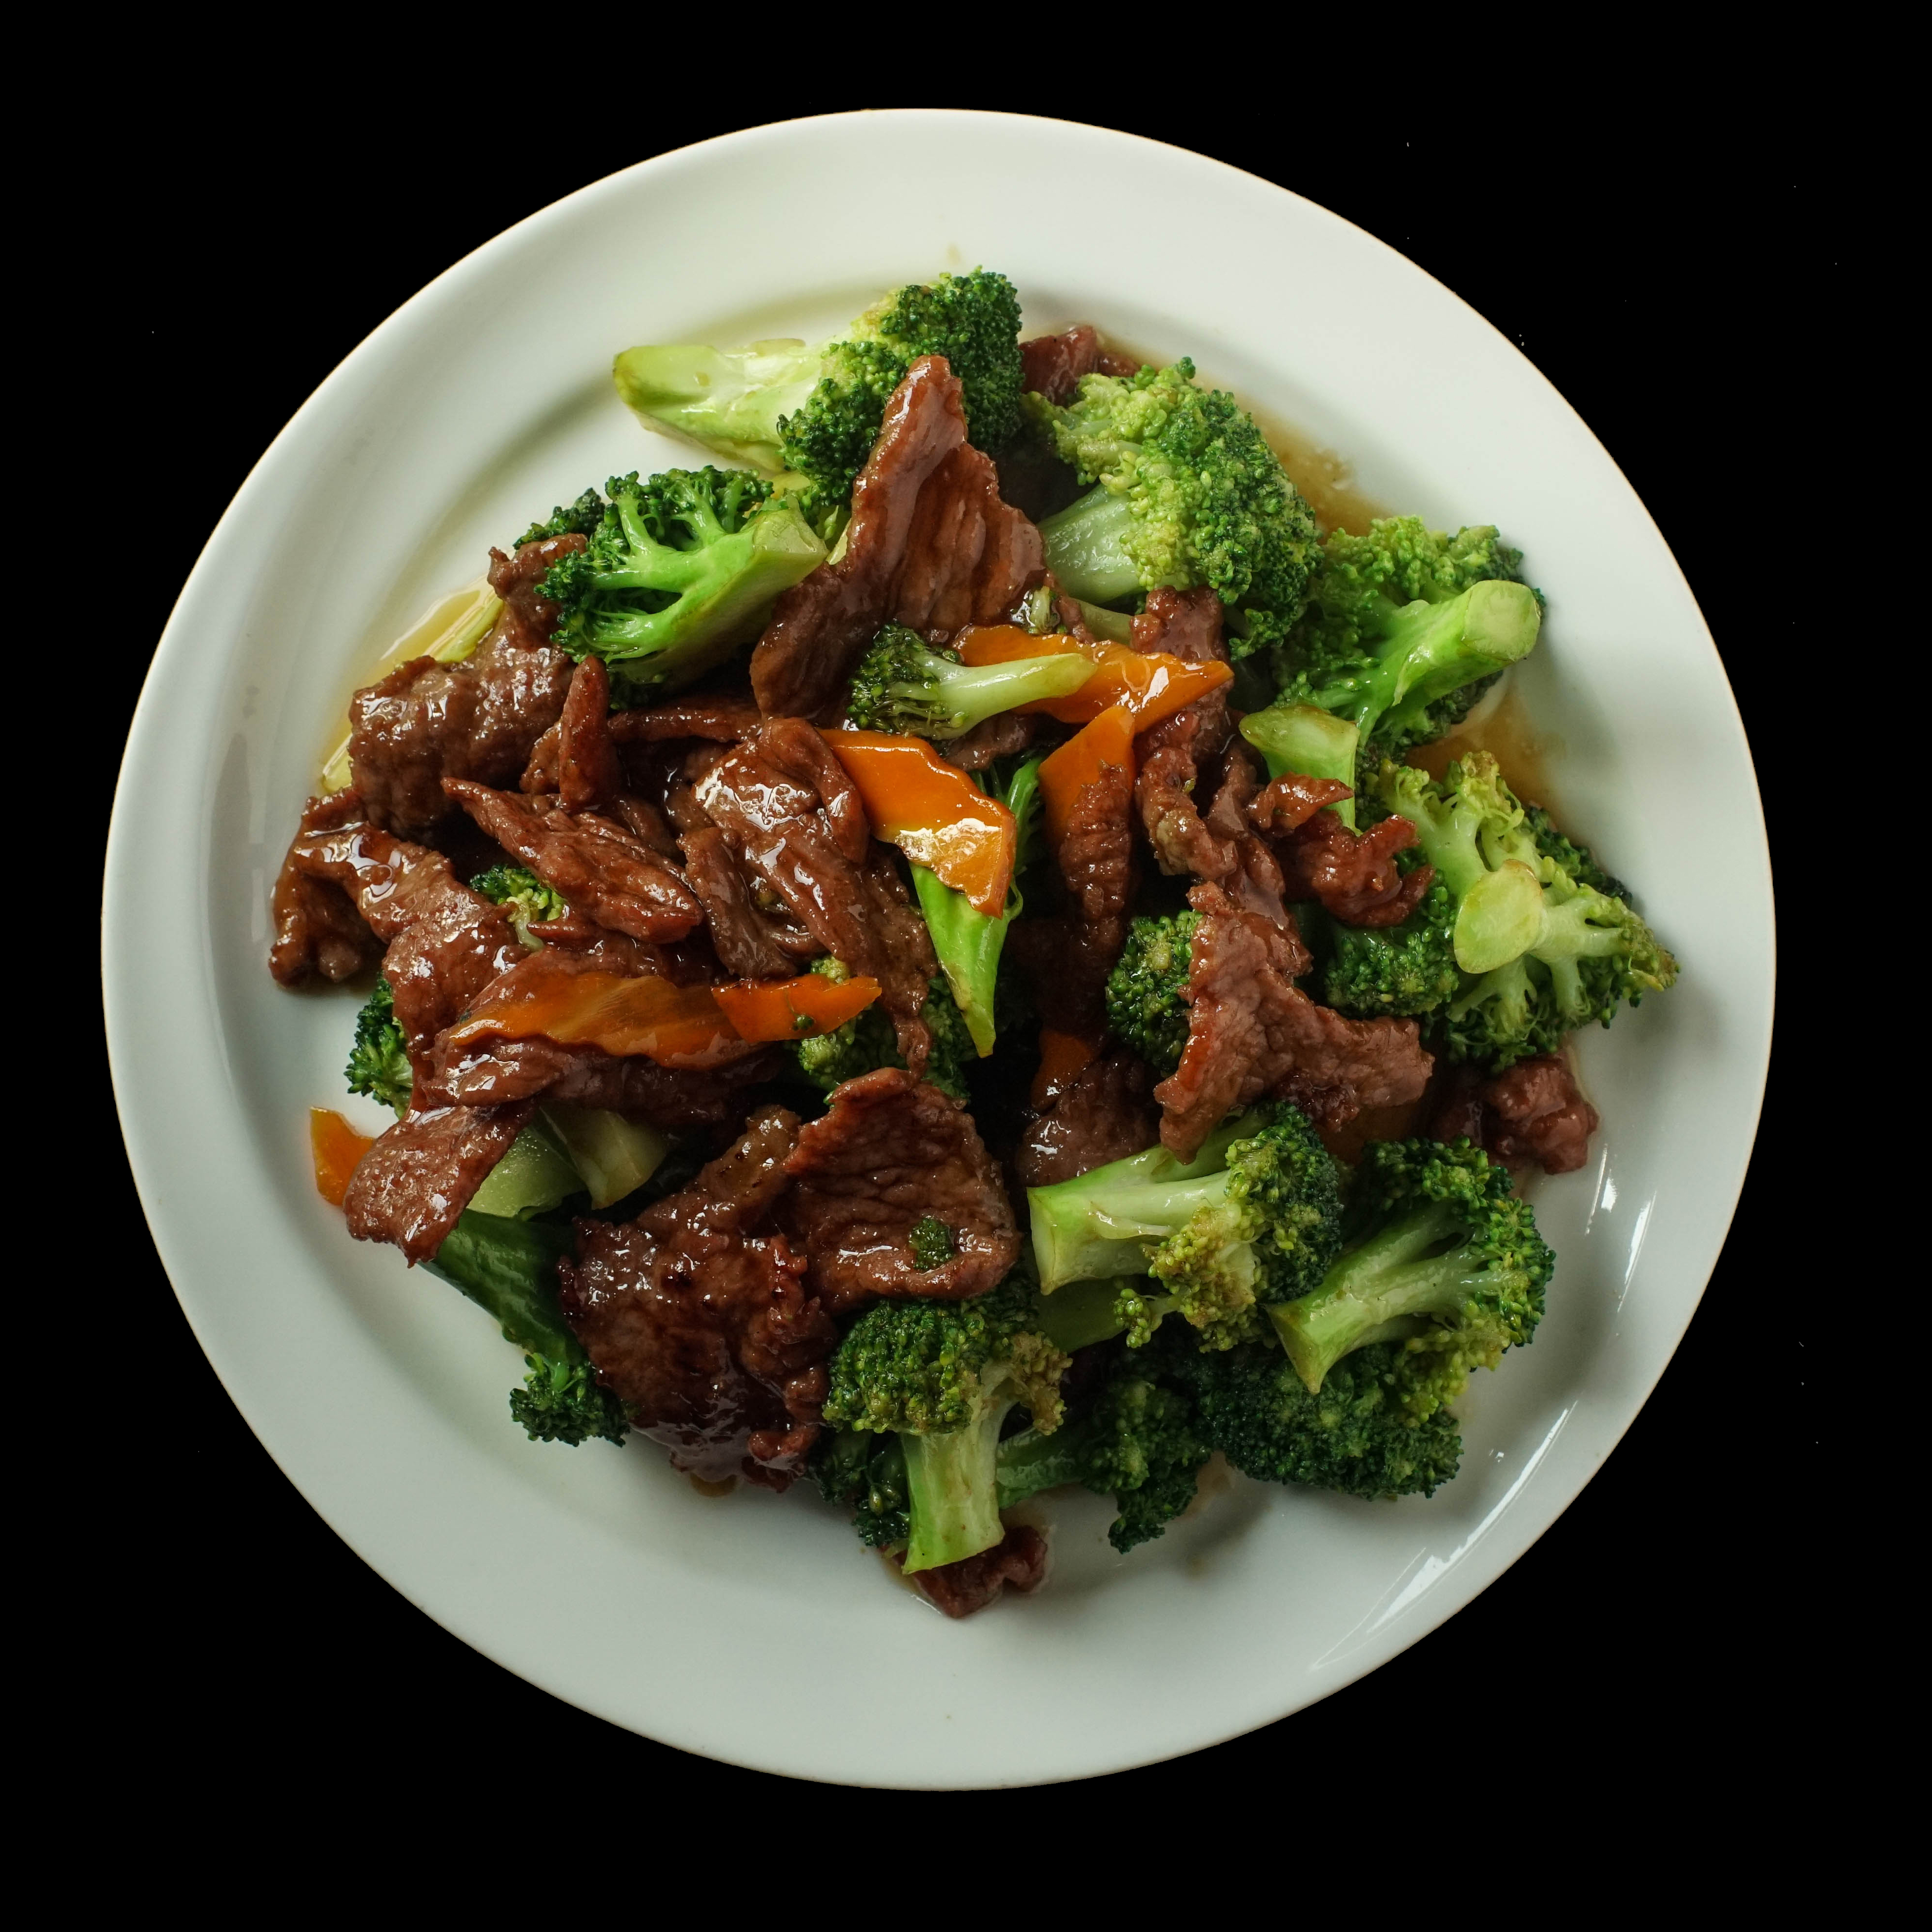 73. 西兰花 Broccoli Image